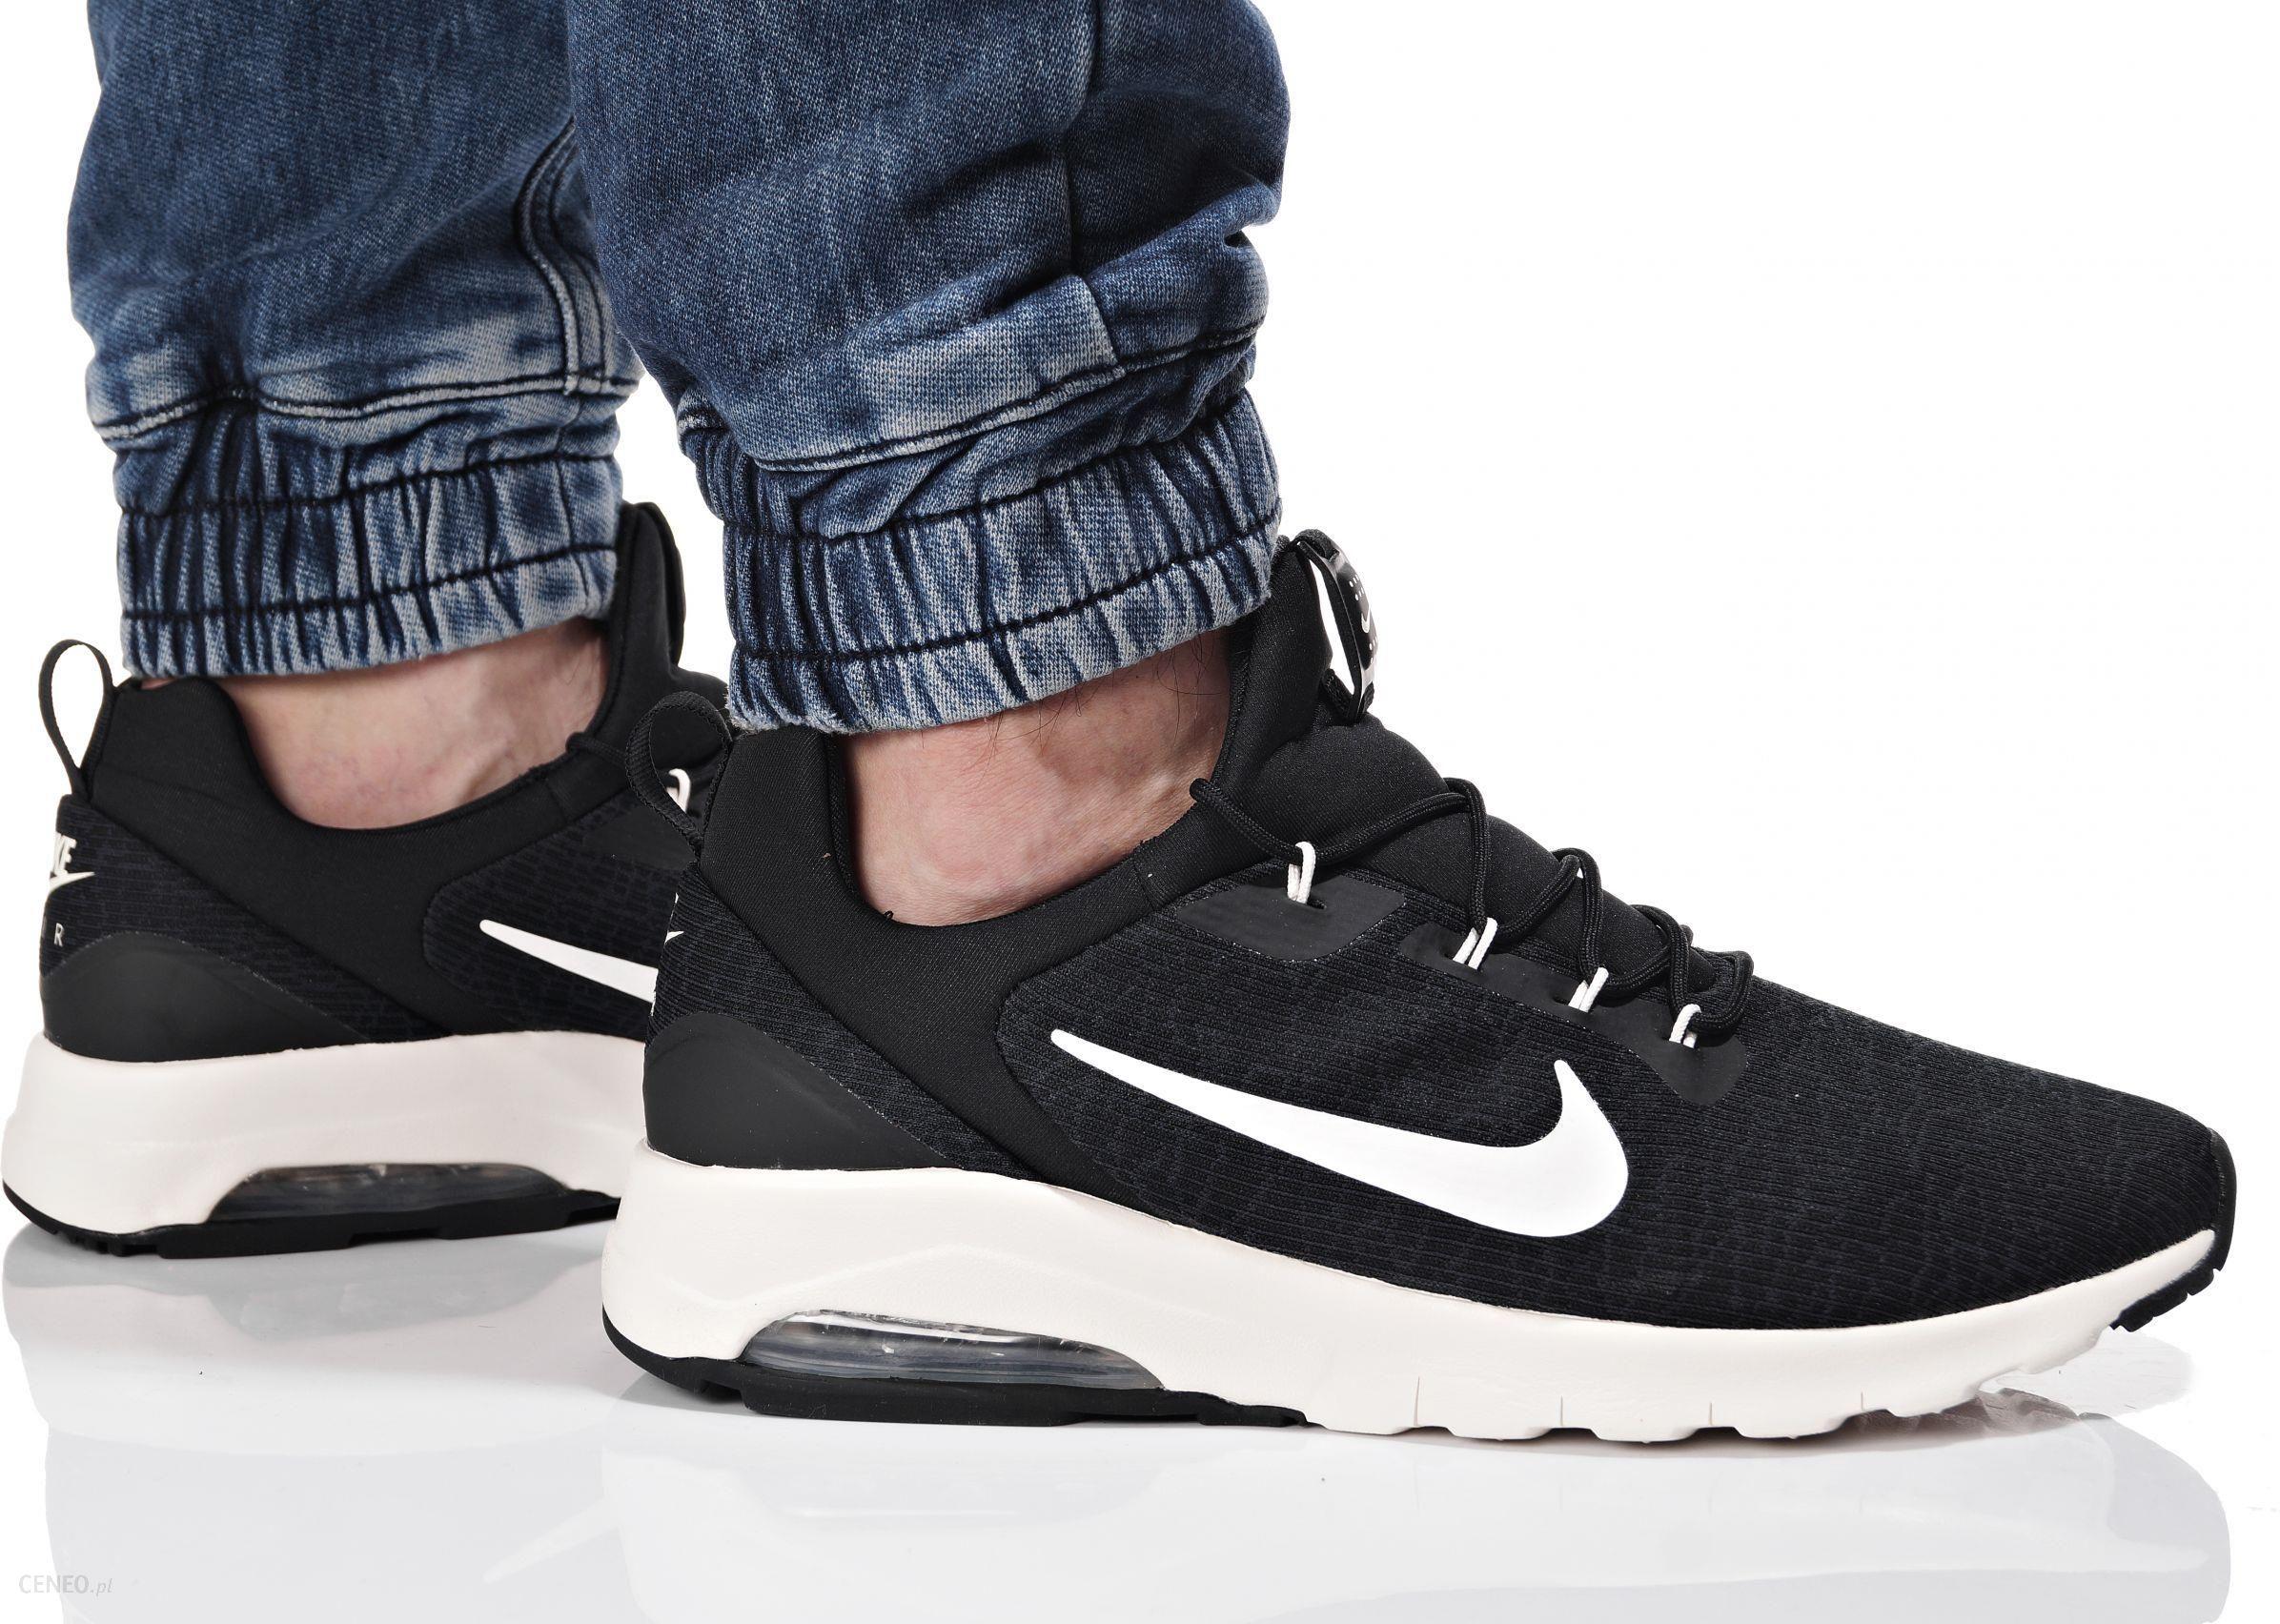 Buty Nike Męskie Air Max Motion Racer 916771 006 Ceny i